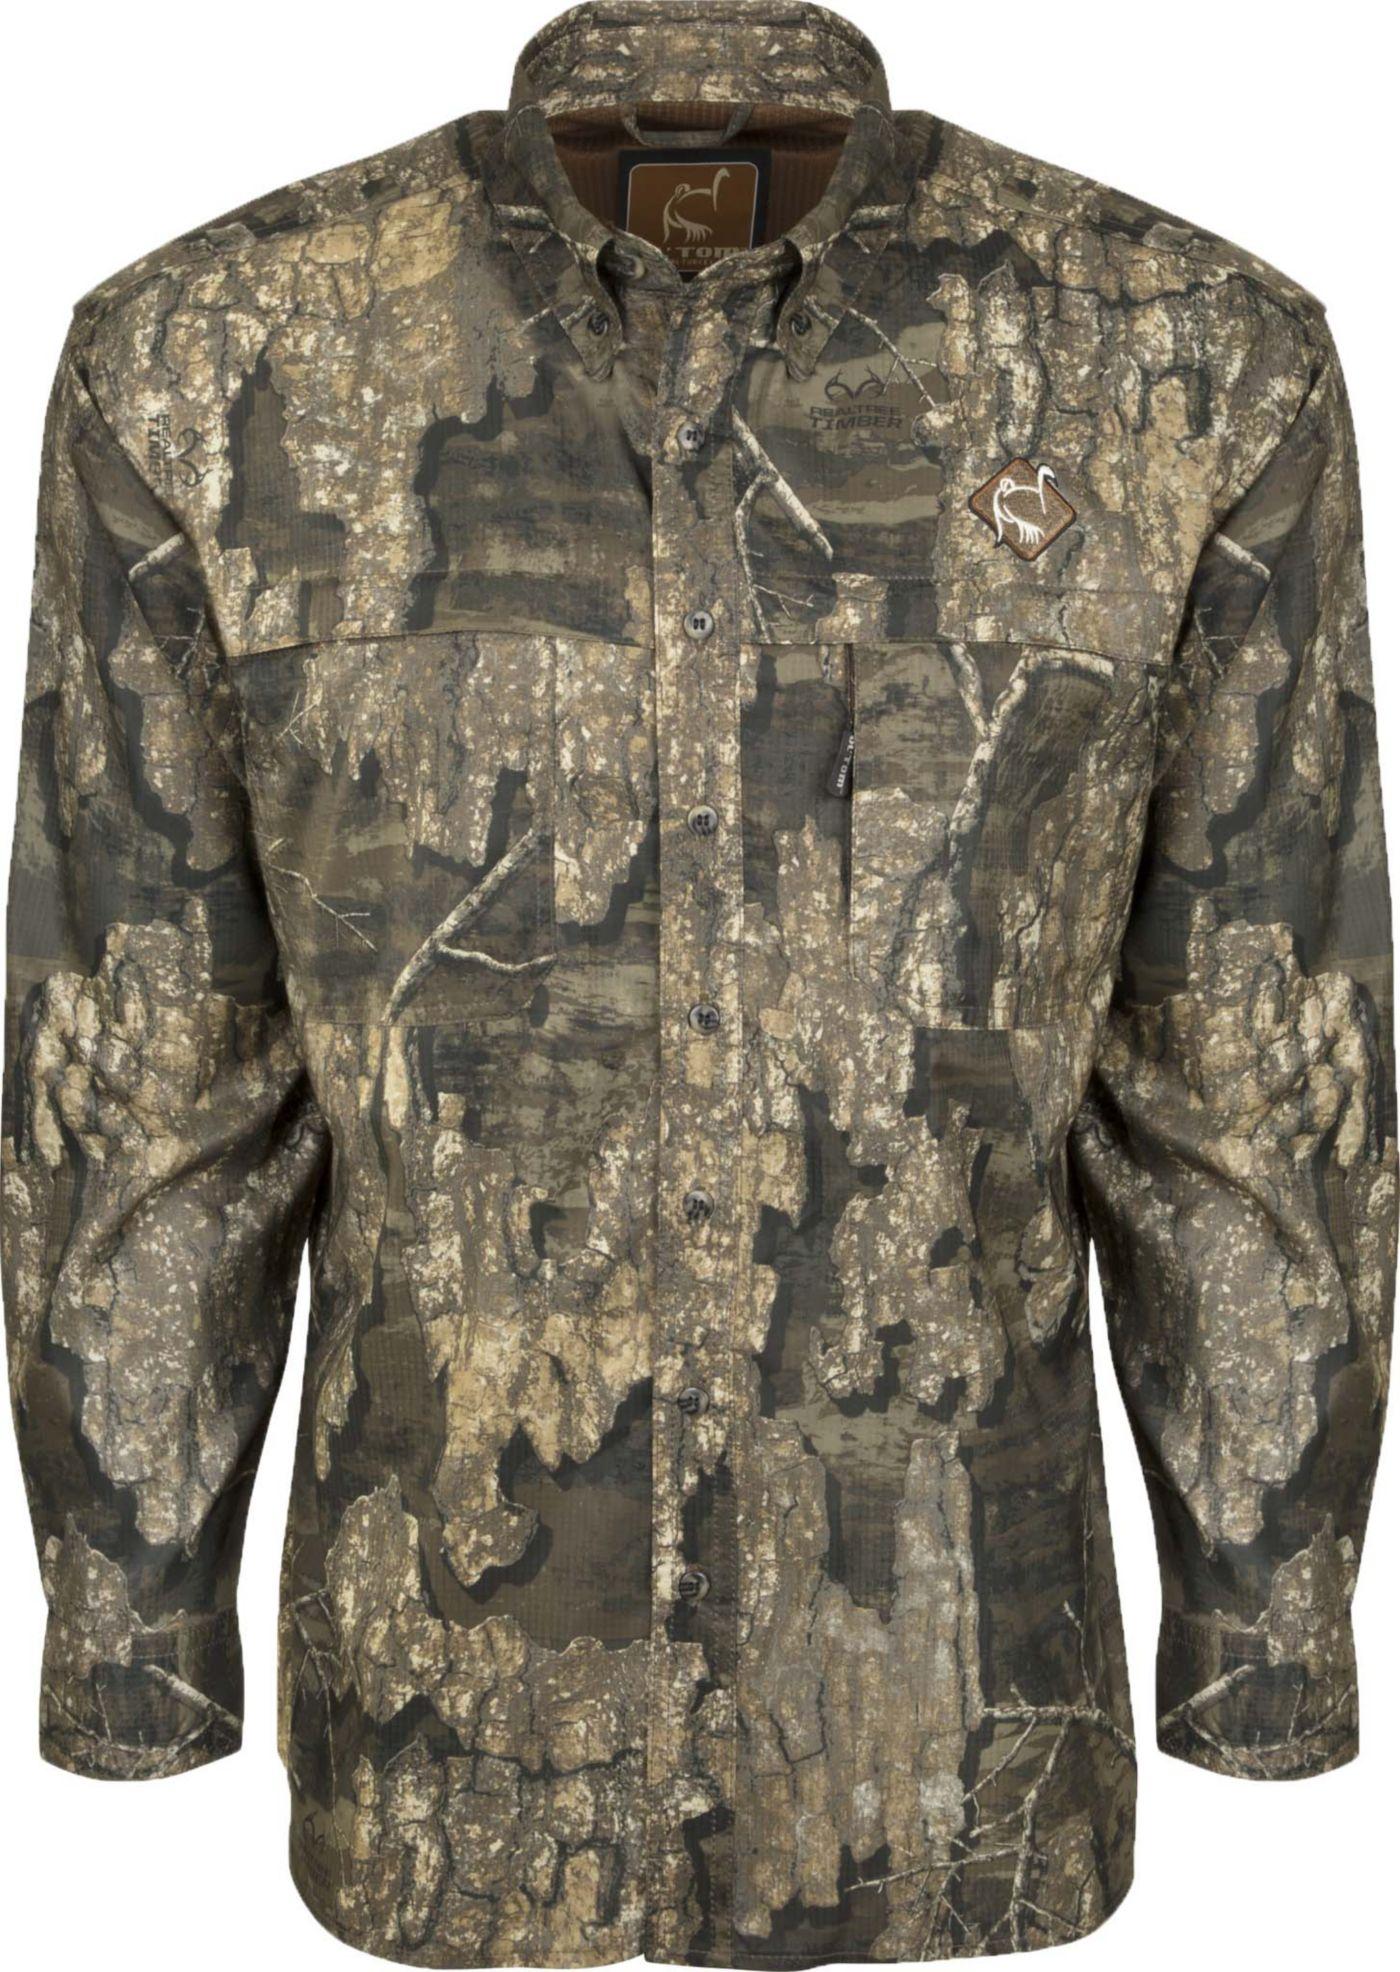 Drake Waterfowl Tech 1/4 Zip Mesh Back Flyweight Turkey Hunting Shirt